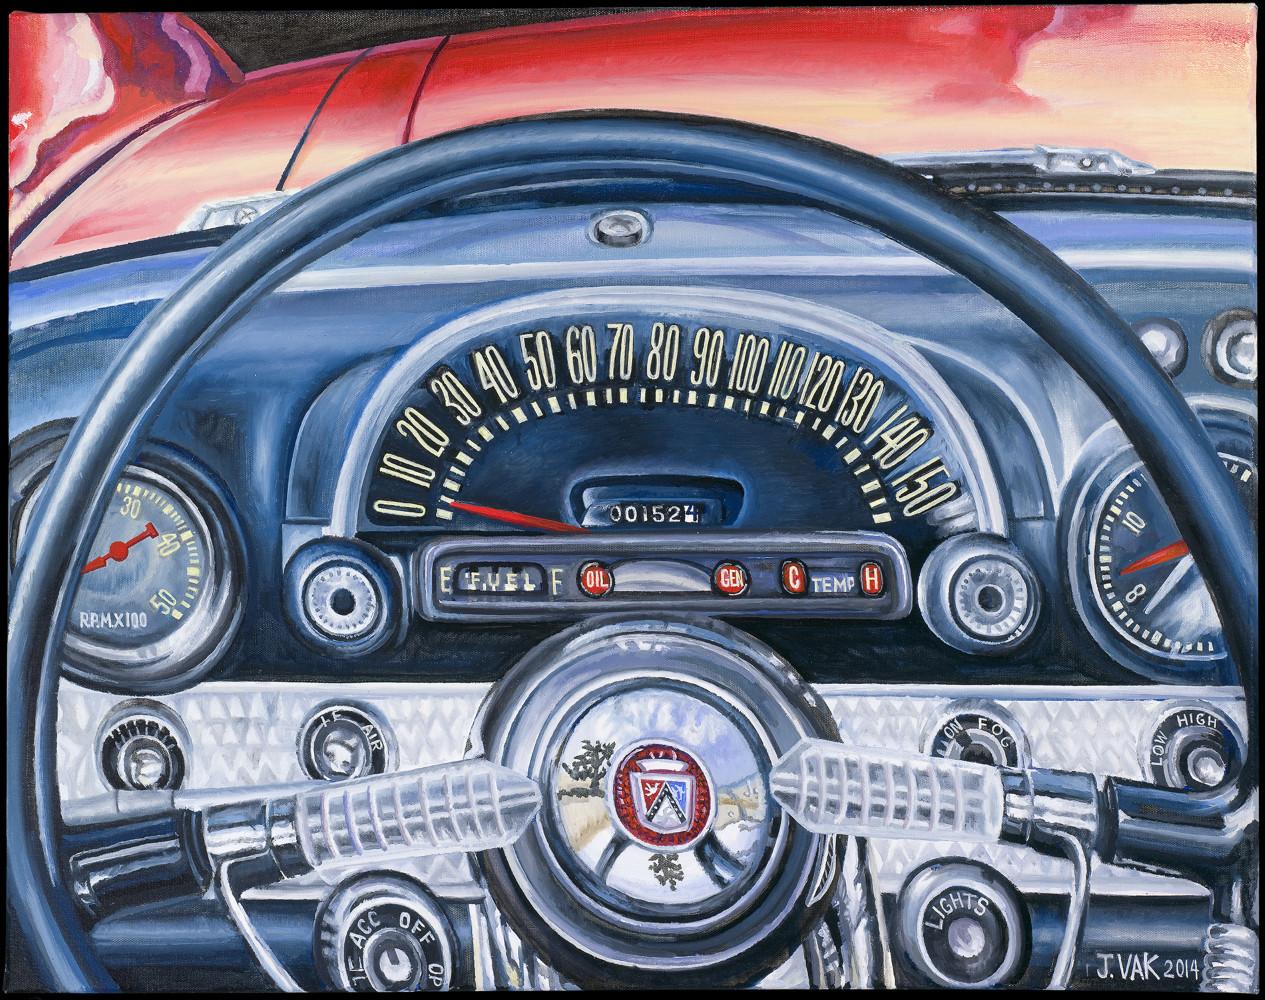 1957 Ford Thunderbird Interior           24x28 Original Oil                   $3500                    2014